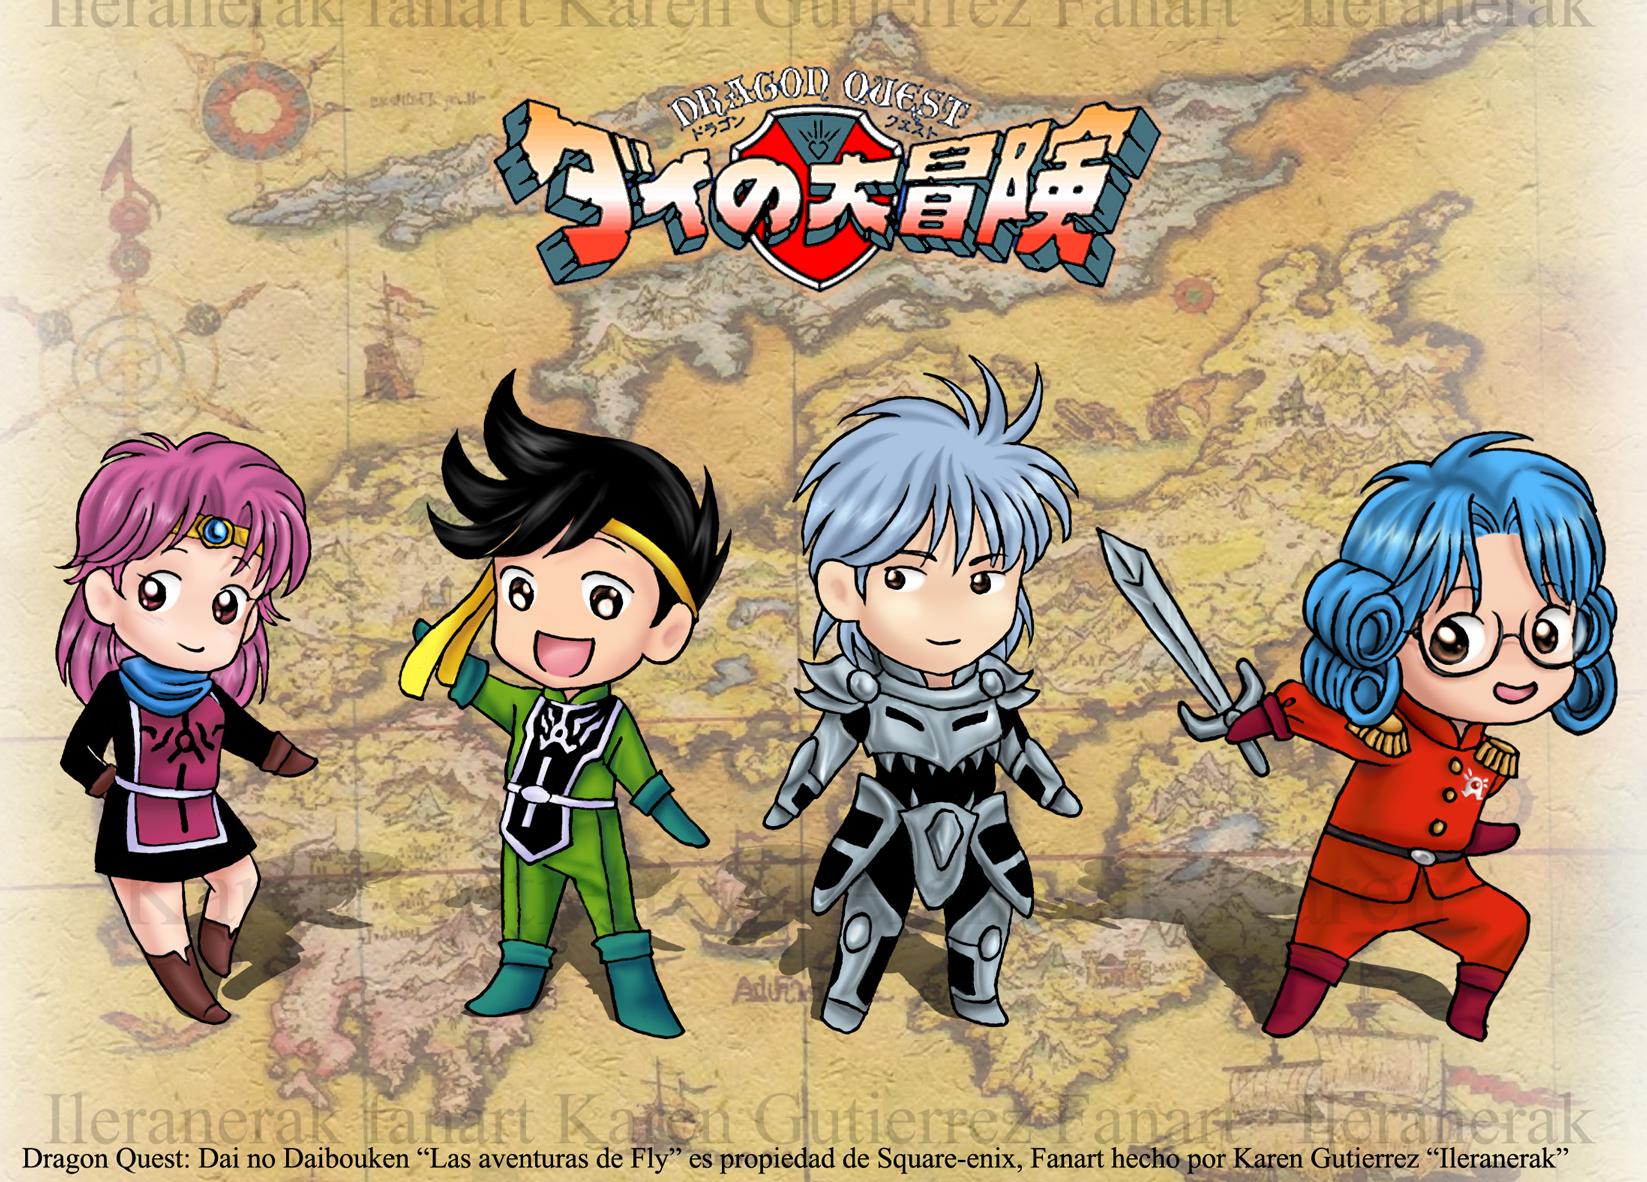 http://fc02.deviantart.com/fs16/f/2007/183/3/3/Dragon_Quest_Dai_no_Daibouken_by_Ileranerak.jpg